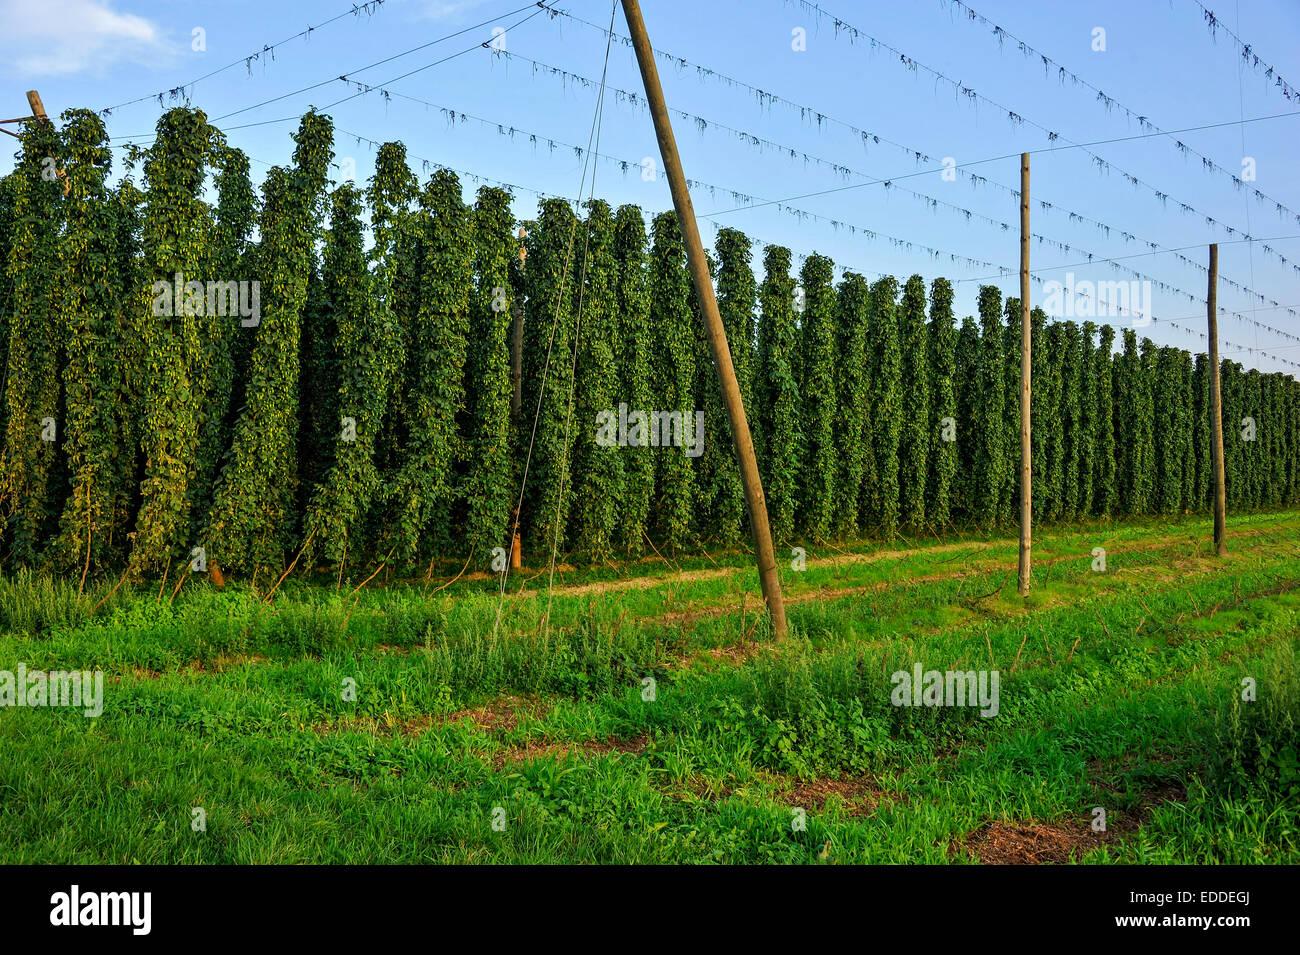 Hop Plants (Humulus Lupulus), Ready For Harvesting, Hop Garden, Harvested  Wire Racks, Right, Biburg, Hallertau Or Holledau Area